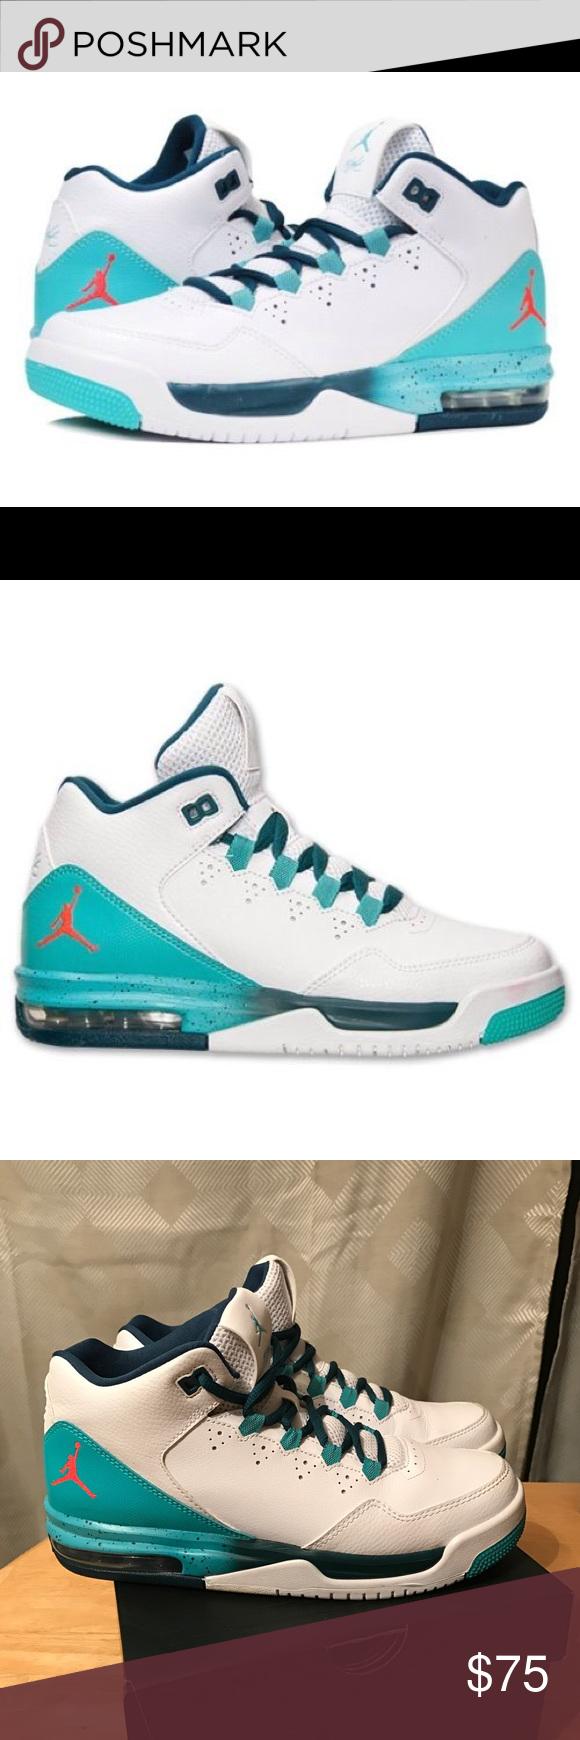 huge selection of 6f710 e6b77 Nike Jordan Flight Origin 2 BG Basketball Sz 7 7y Nike Jordan Flight Origin  2 BG